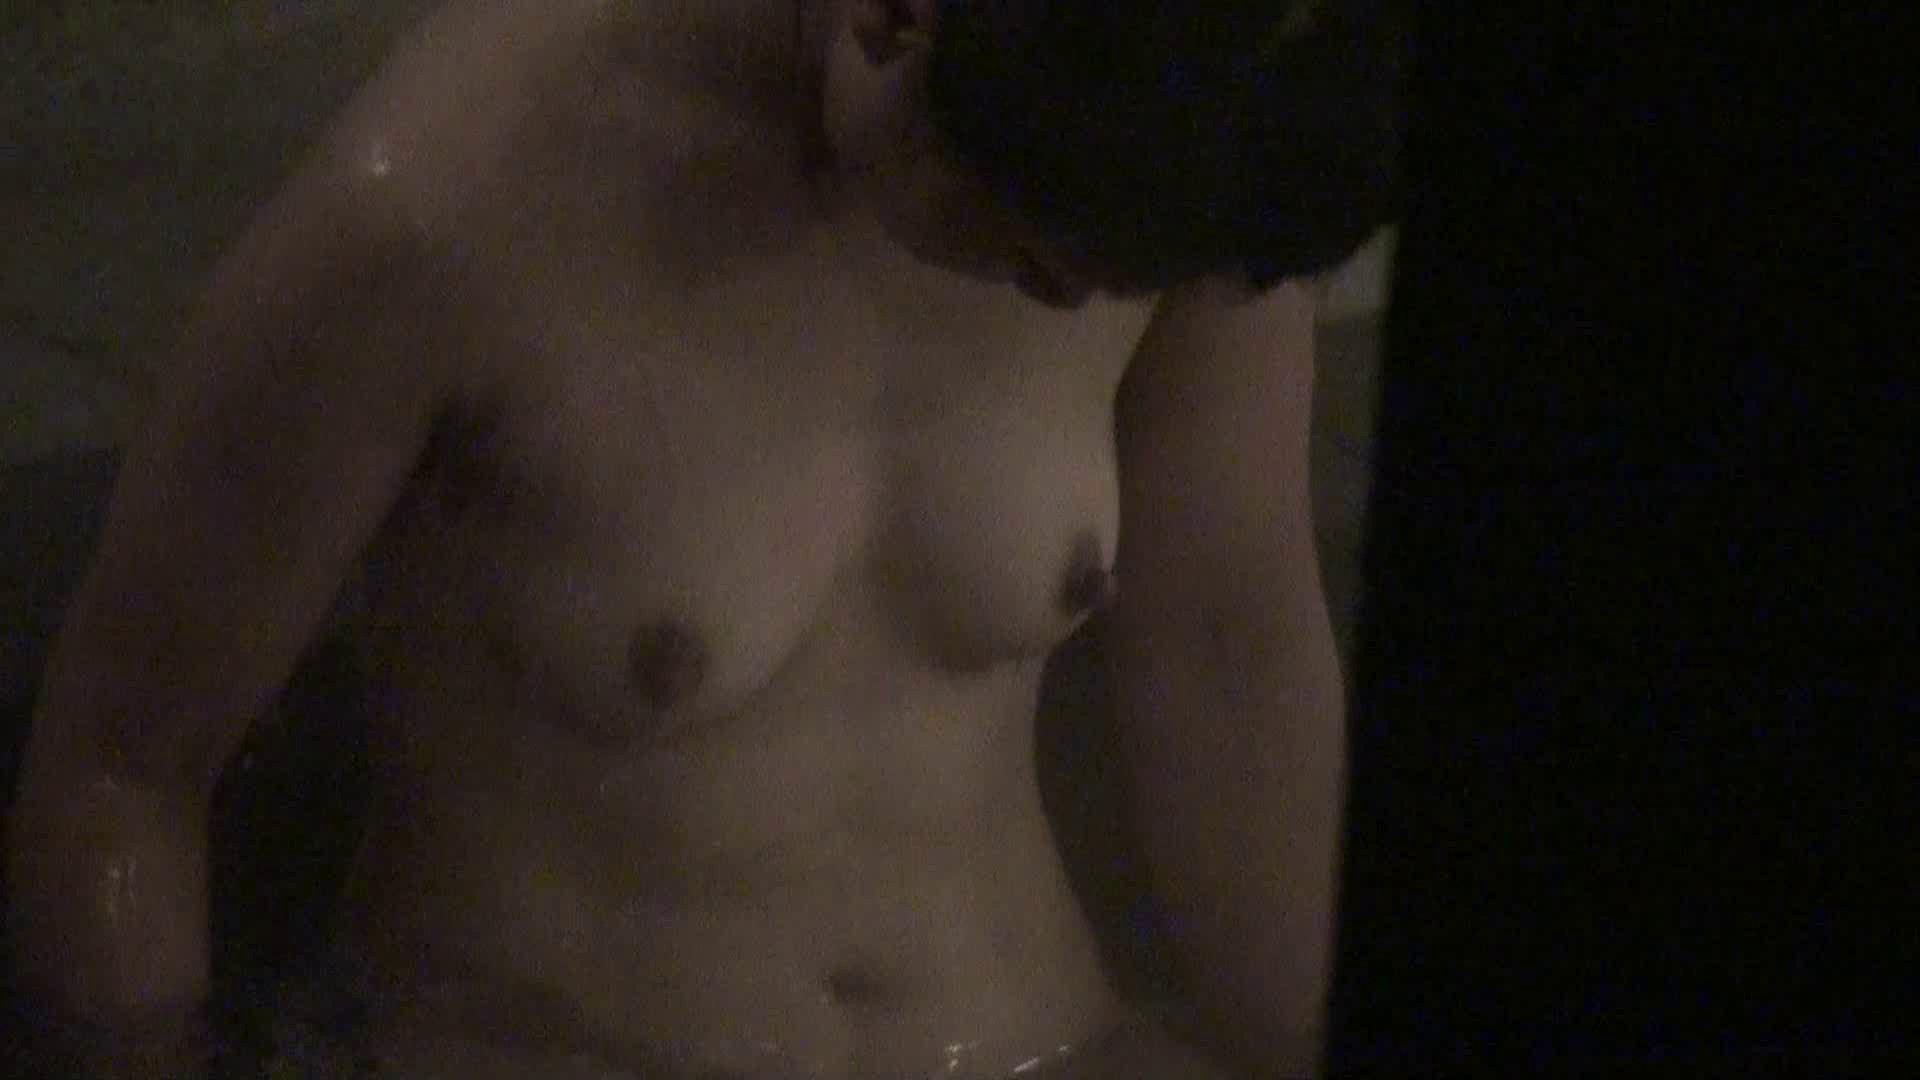 Aquaな露天風呂Vol.426 OLセックス 盗み撮りオマンコ動画キャプチャ 106画像 53